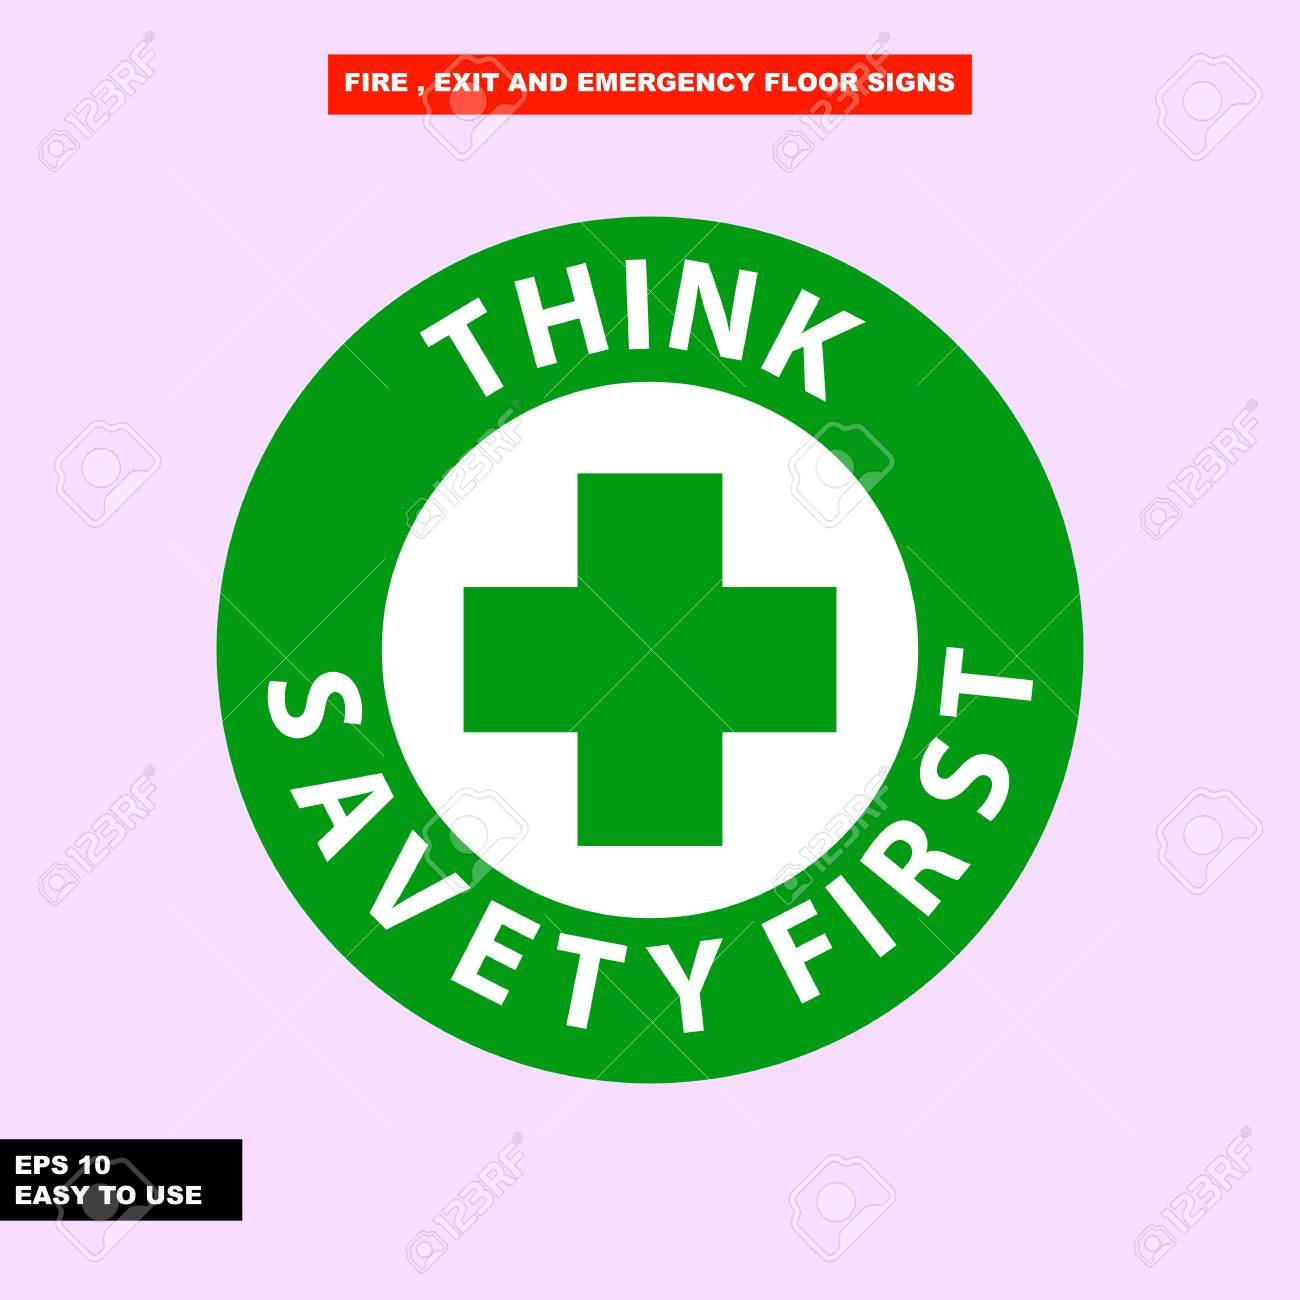 Think Safety First Logo